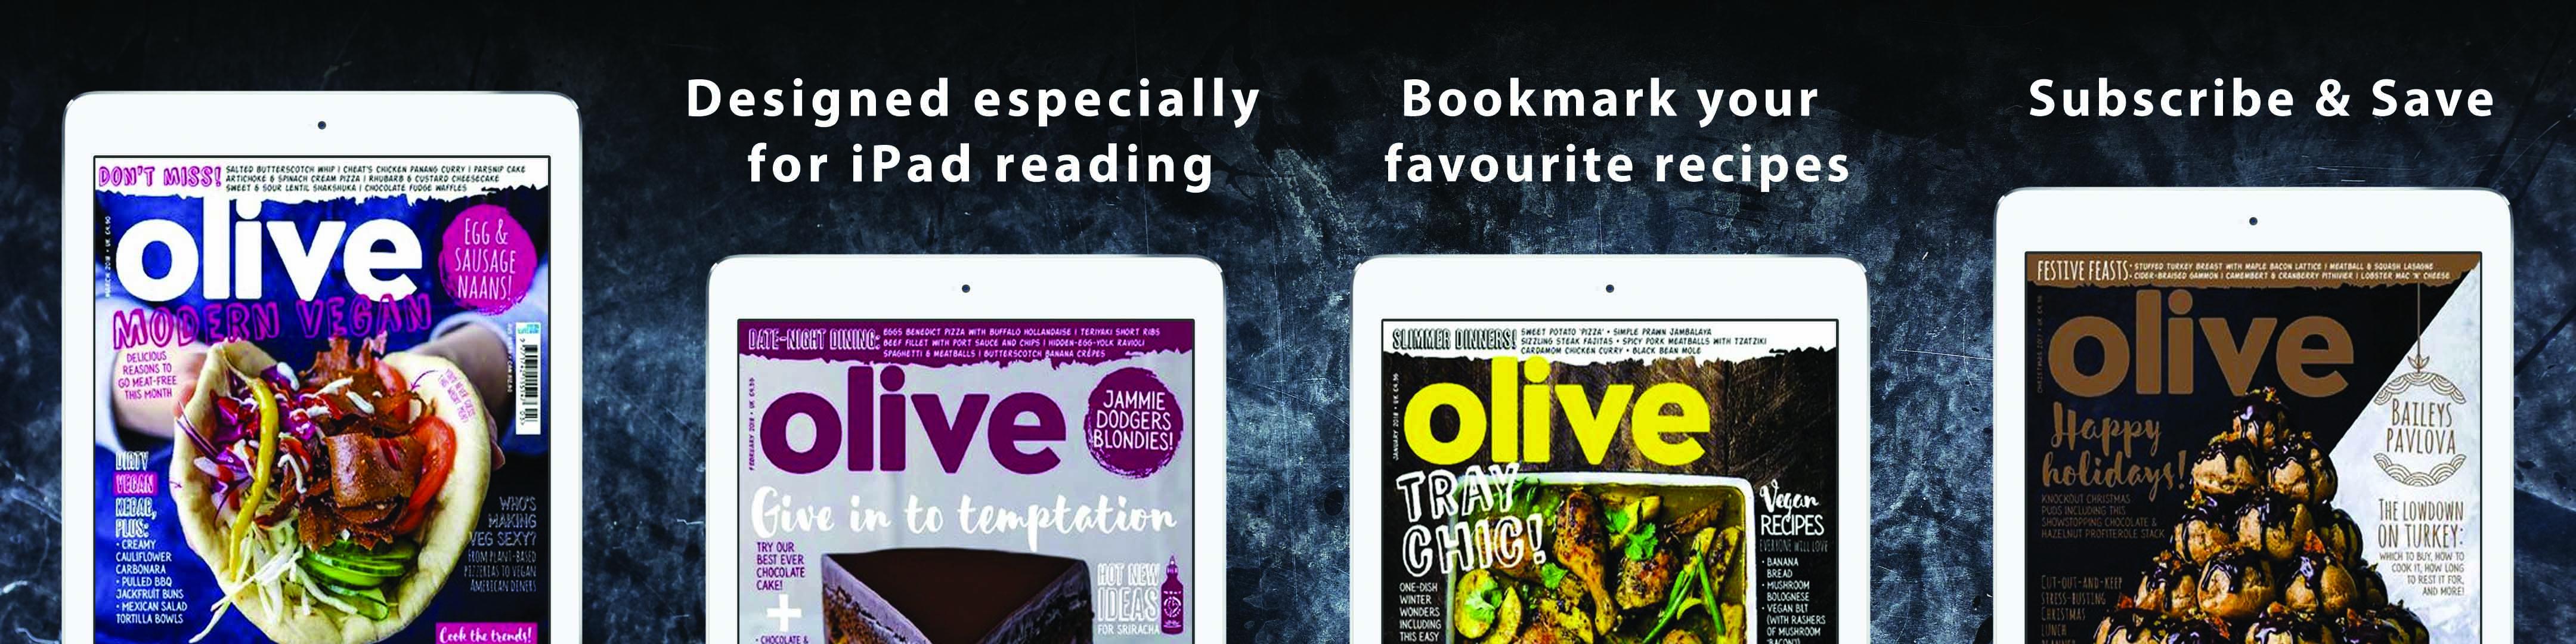 olive magazine app buy